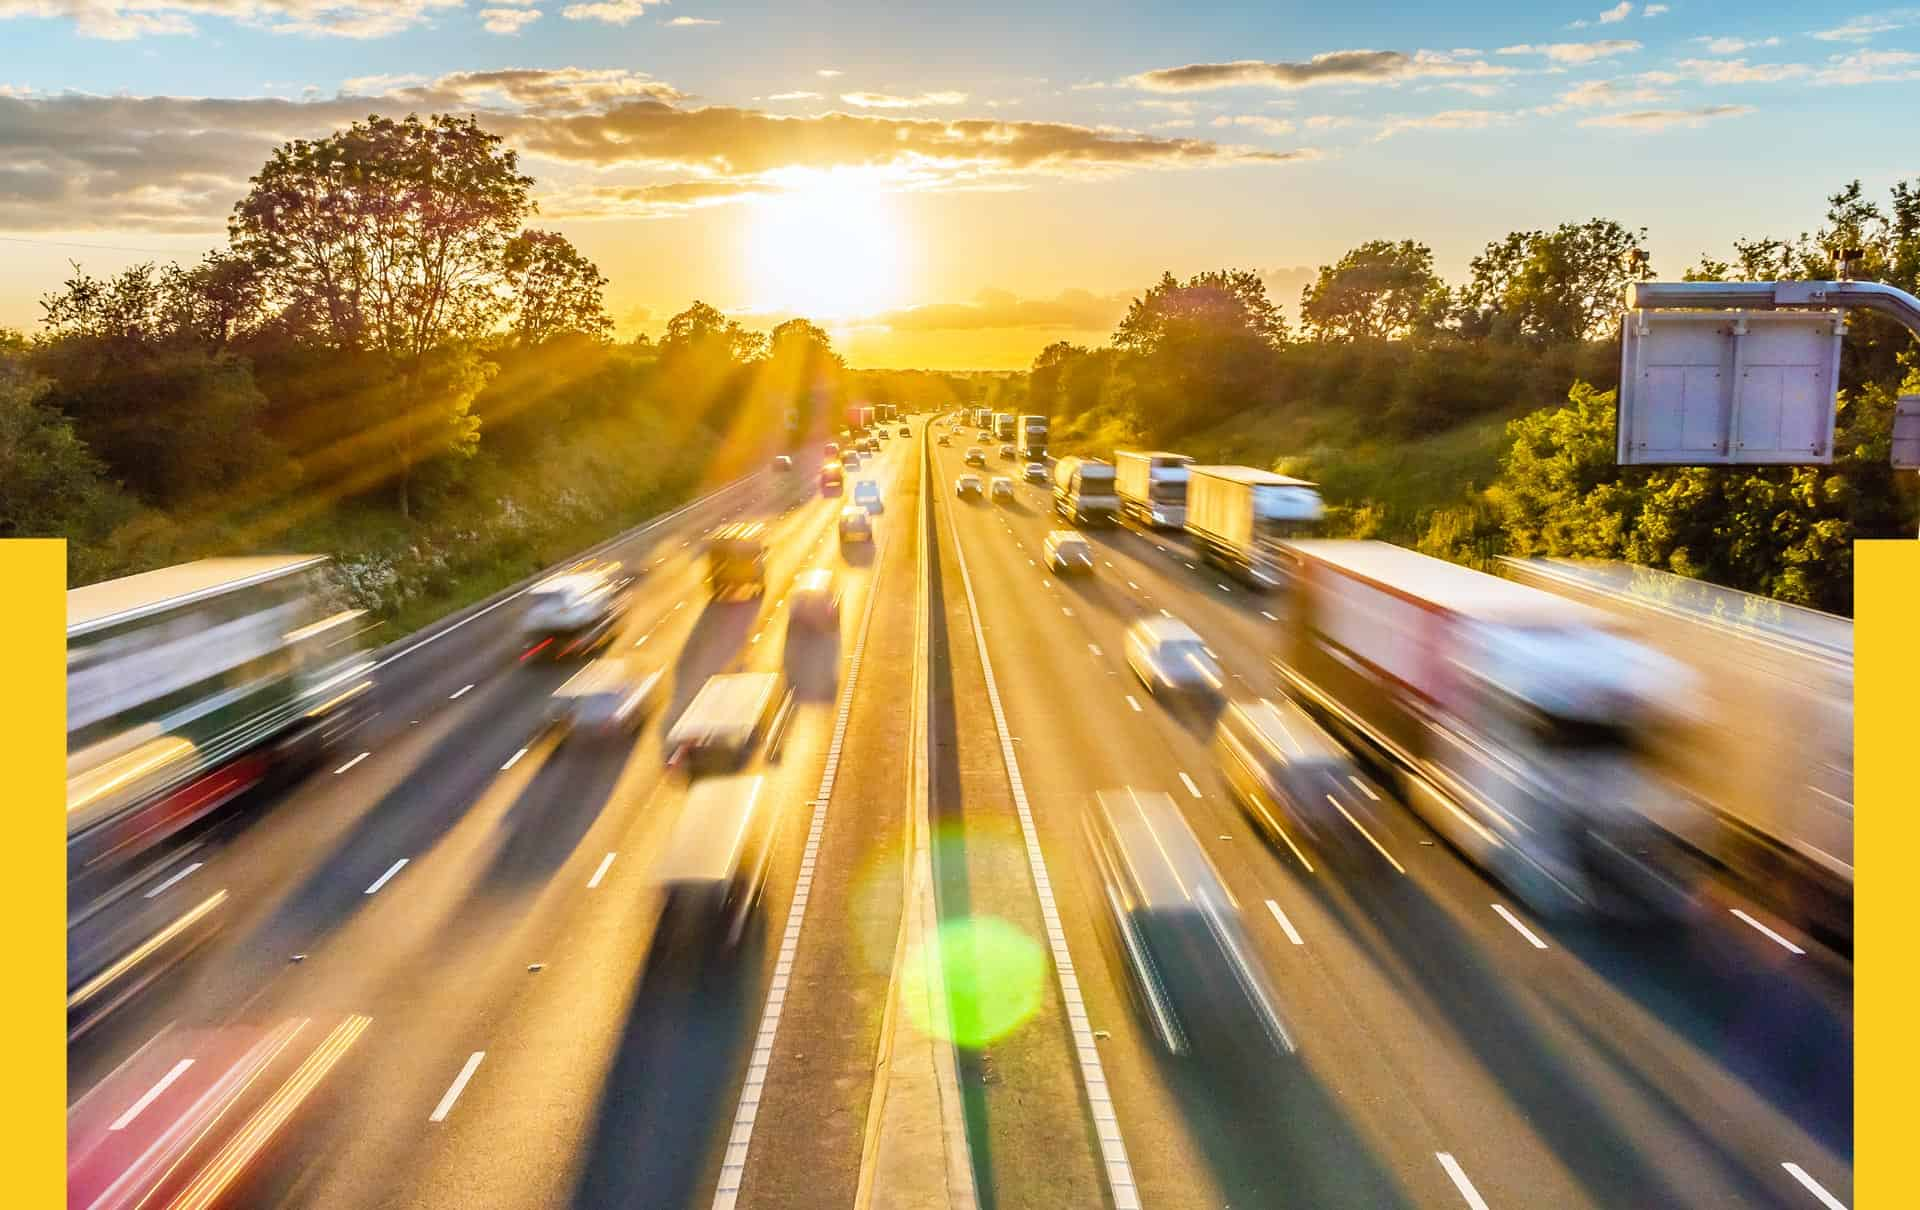 Verkehrsrecht: Folgen eines Geschwindigkeitsverstoßes bei medizinischem Notfall?